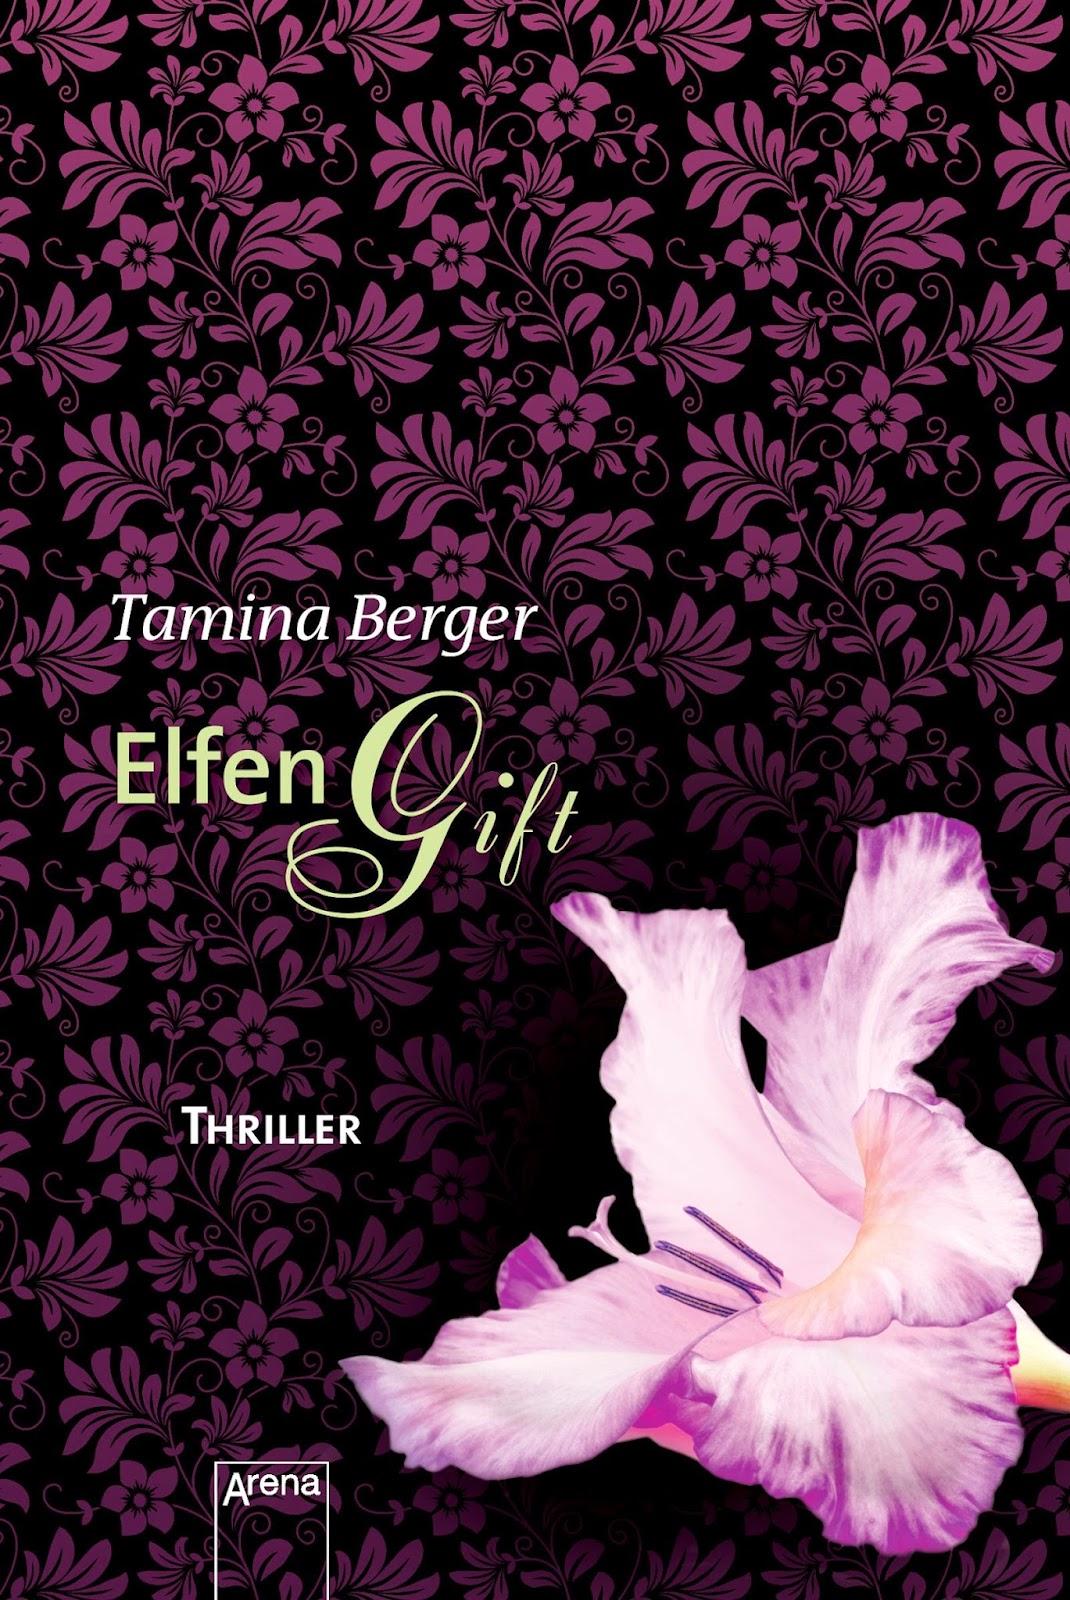 http://www.amazon.de/Elfengift-Arena-Thriller-Tamina-Berger/dp/3401600265/ref=sr_1_1?ie=UTF8&qid=1427557518&sr=8-1&keywords=elfengift